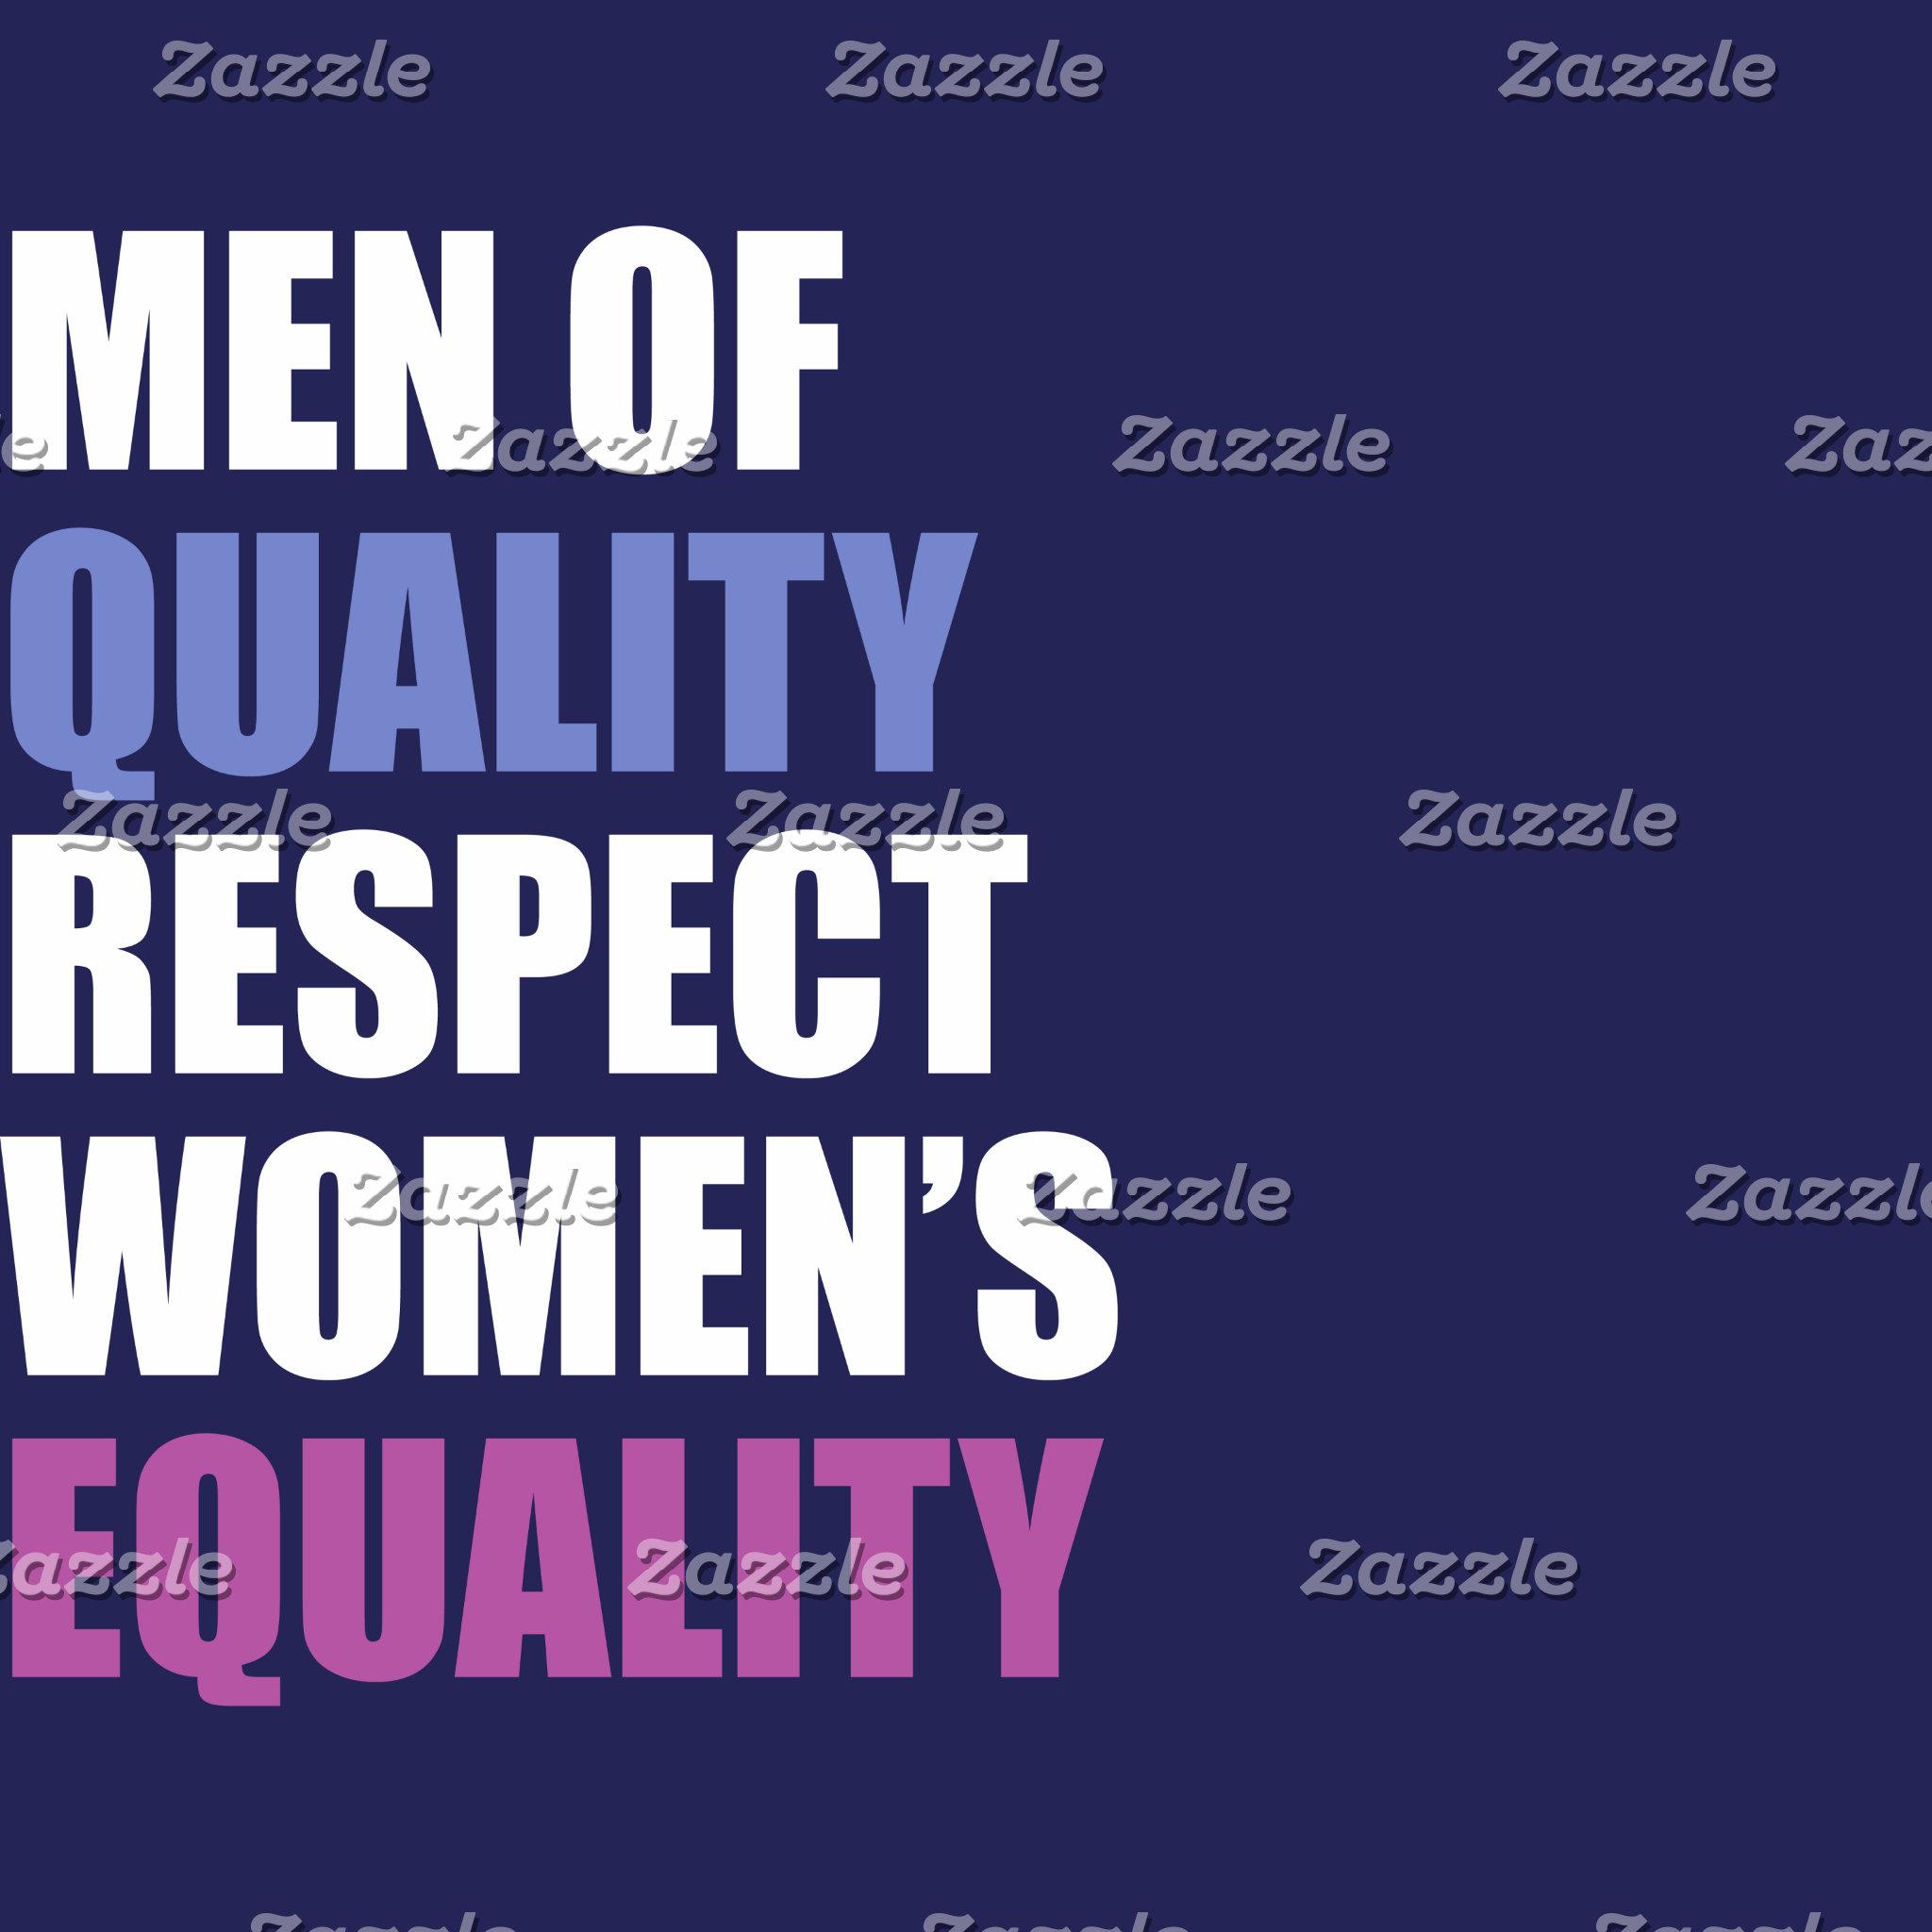 Men of quality...